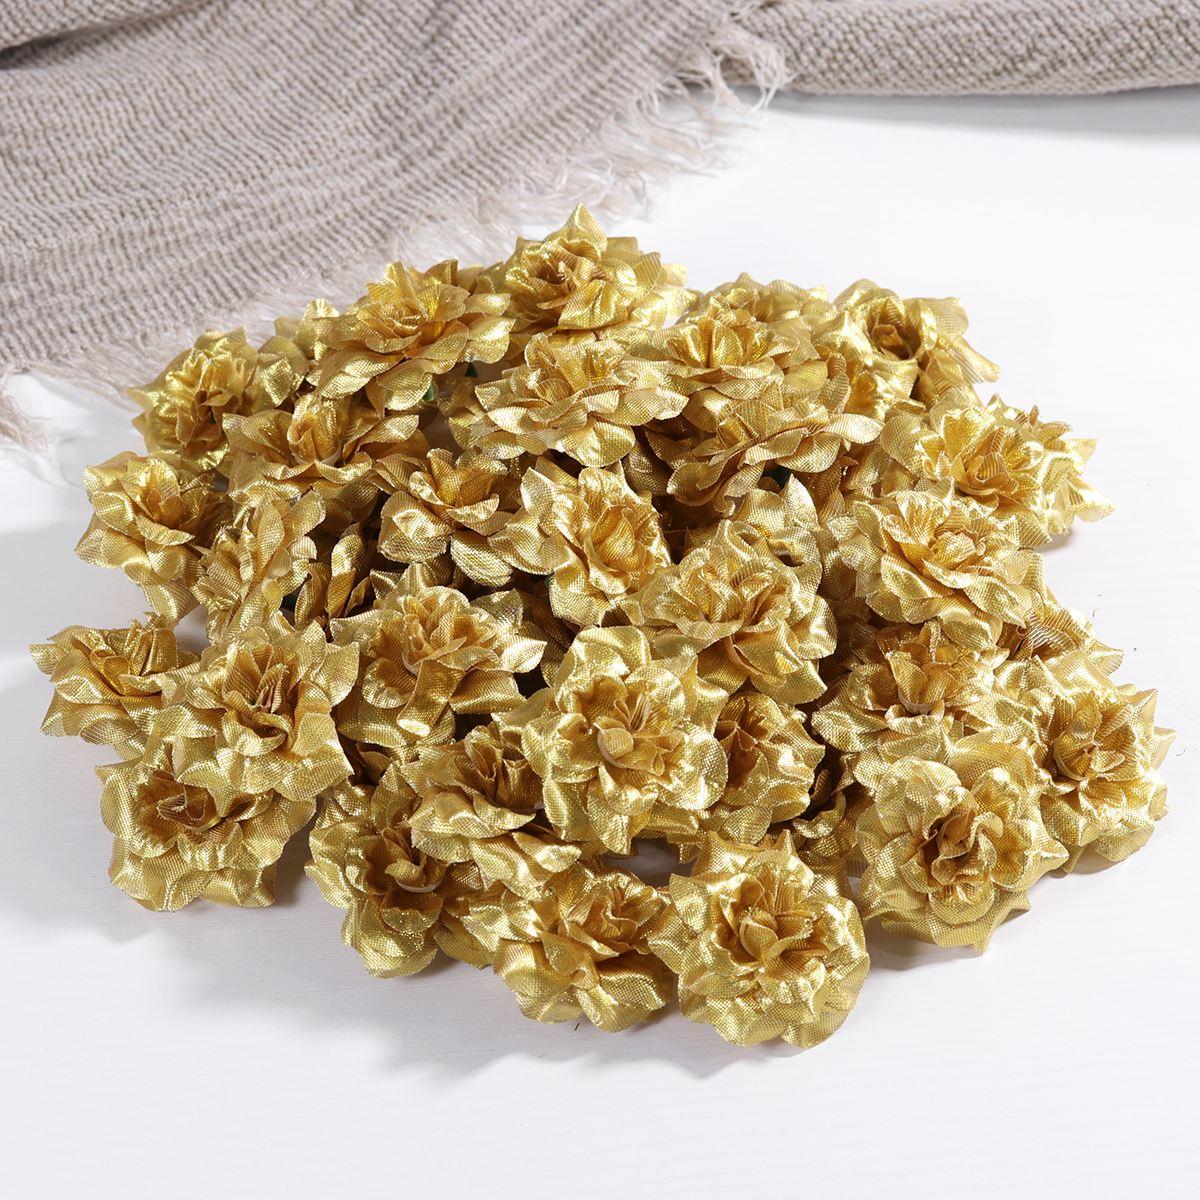 50PCS Premium Artificial Lifelike 4.5CM Roses Flower Heads For Festive Wedding Home Party Decoration